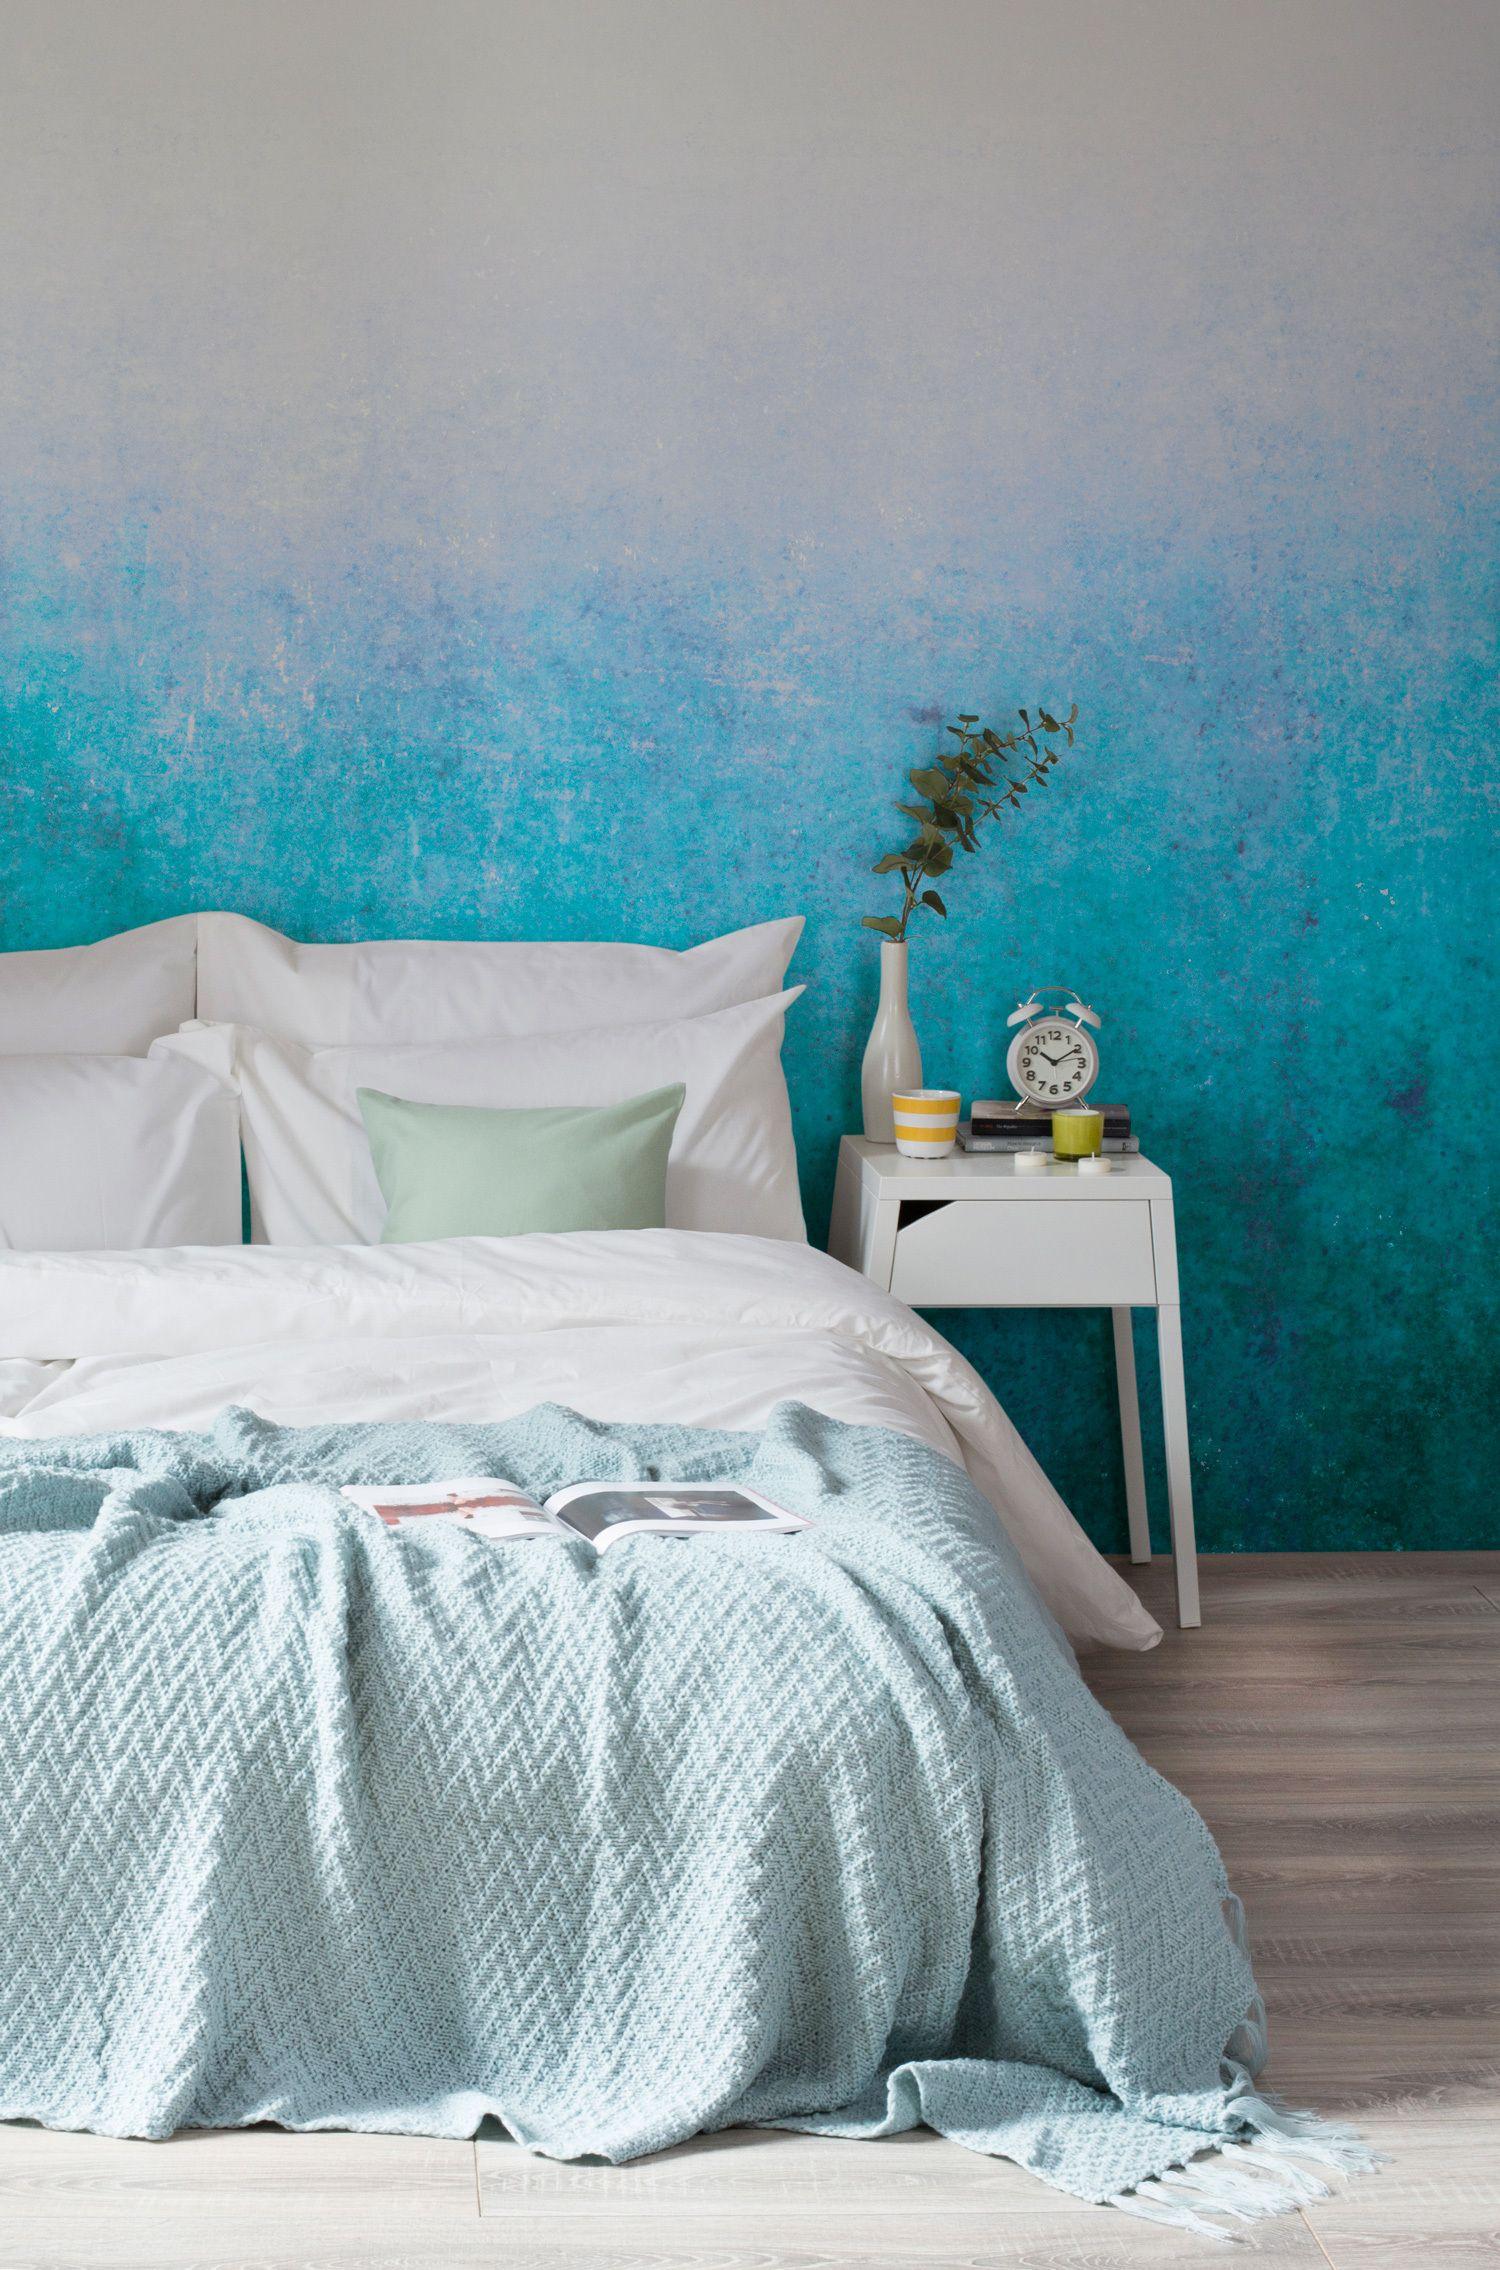 Blue Grunge Ombre Wallpaper Mural Hovia Apartment Decor Inspiration Apartment Decor Bedroom Wall Blue wallpaper room inspiration